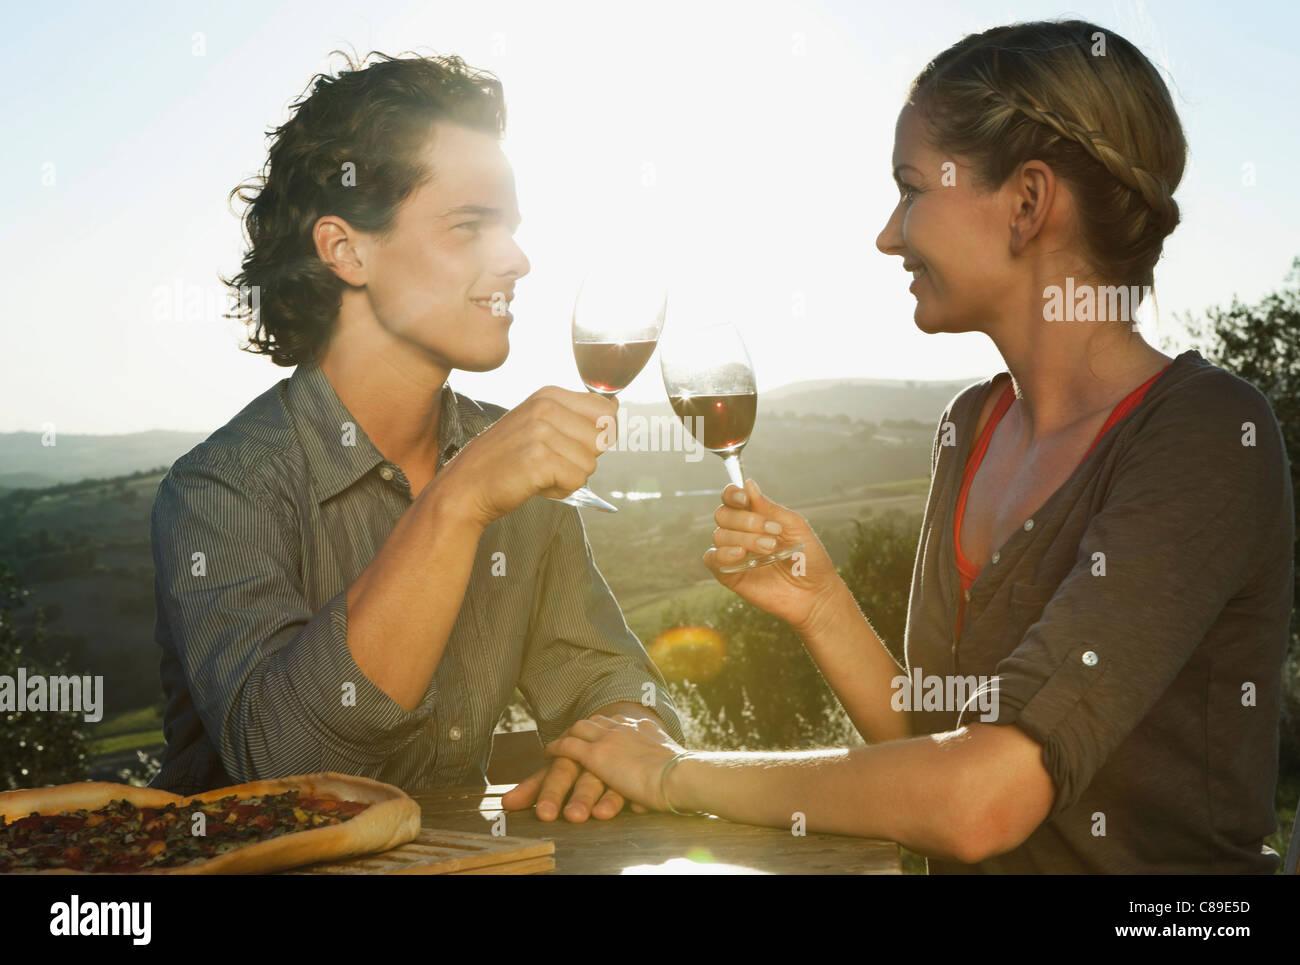 Italy, Tuscany, Young couple clinking wine glasses at dusk - Stock Image